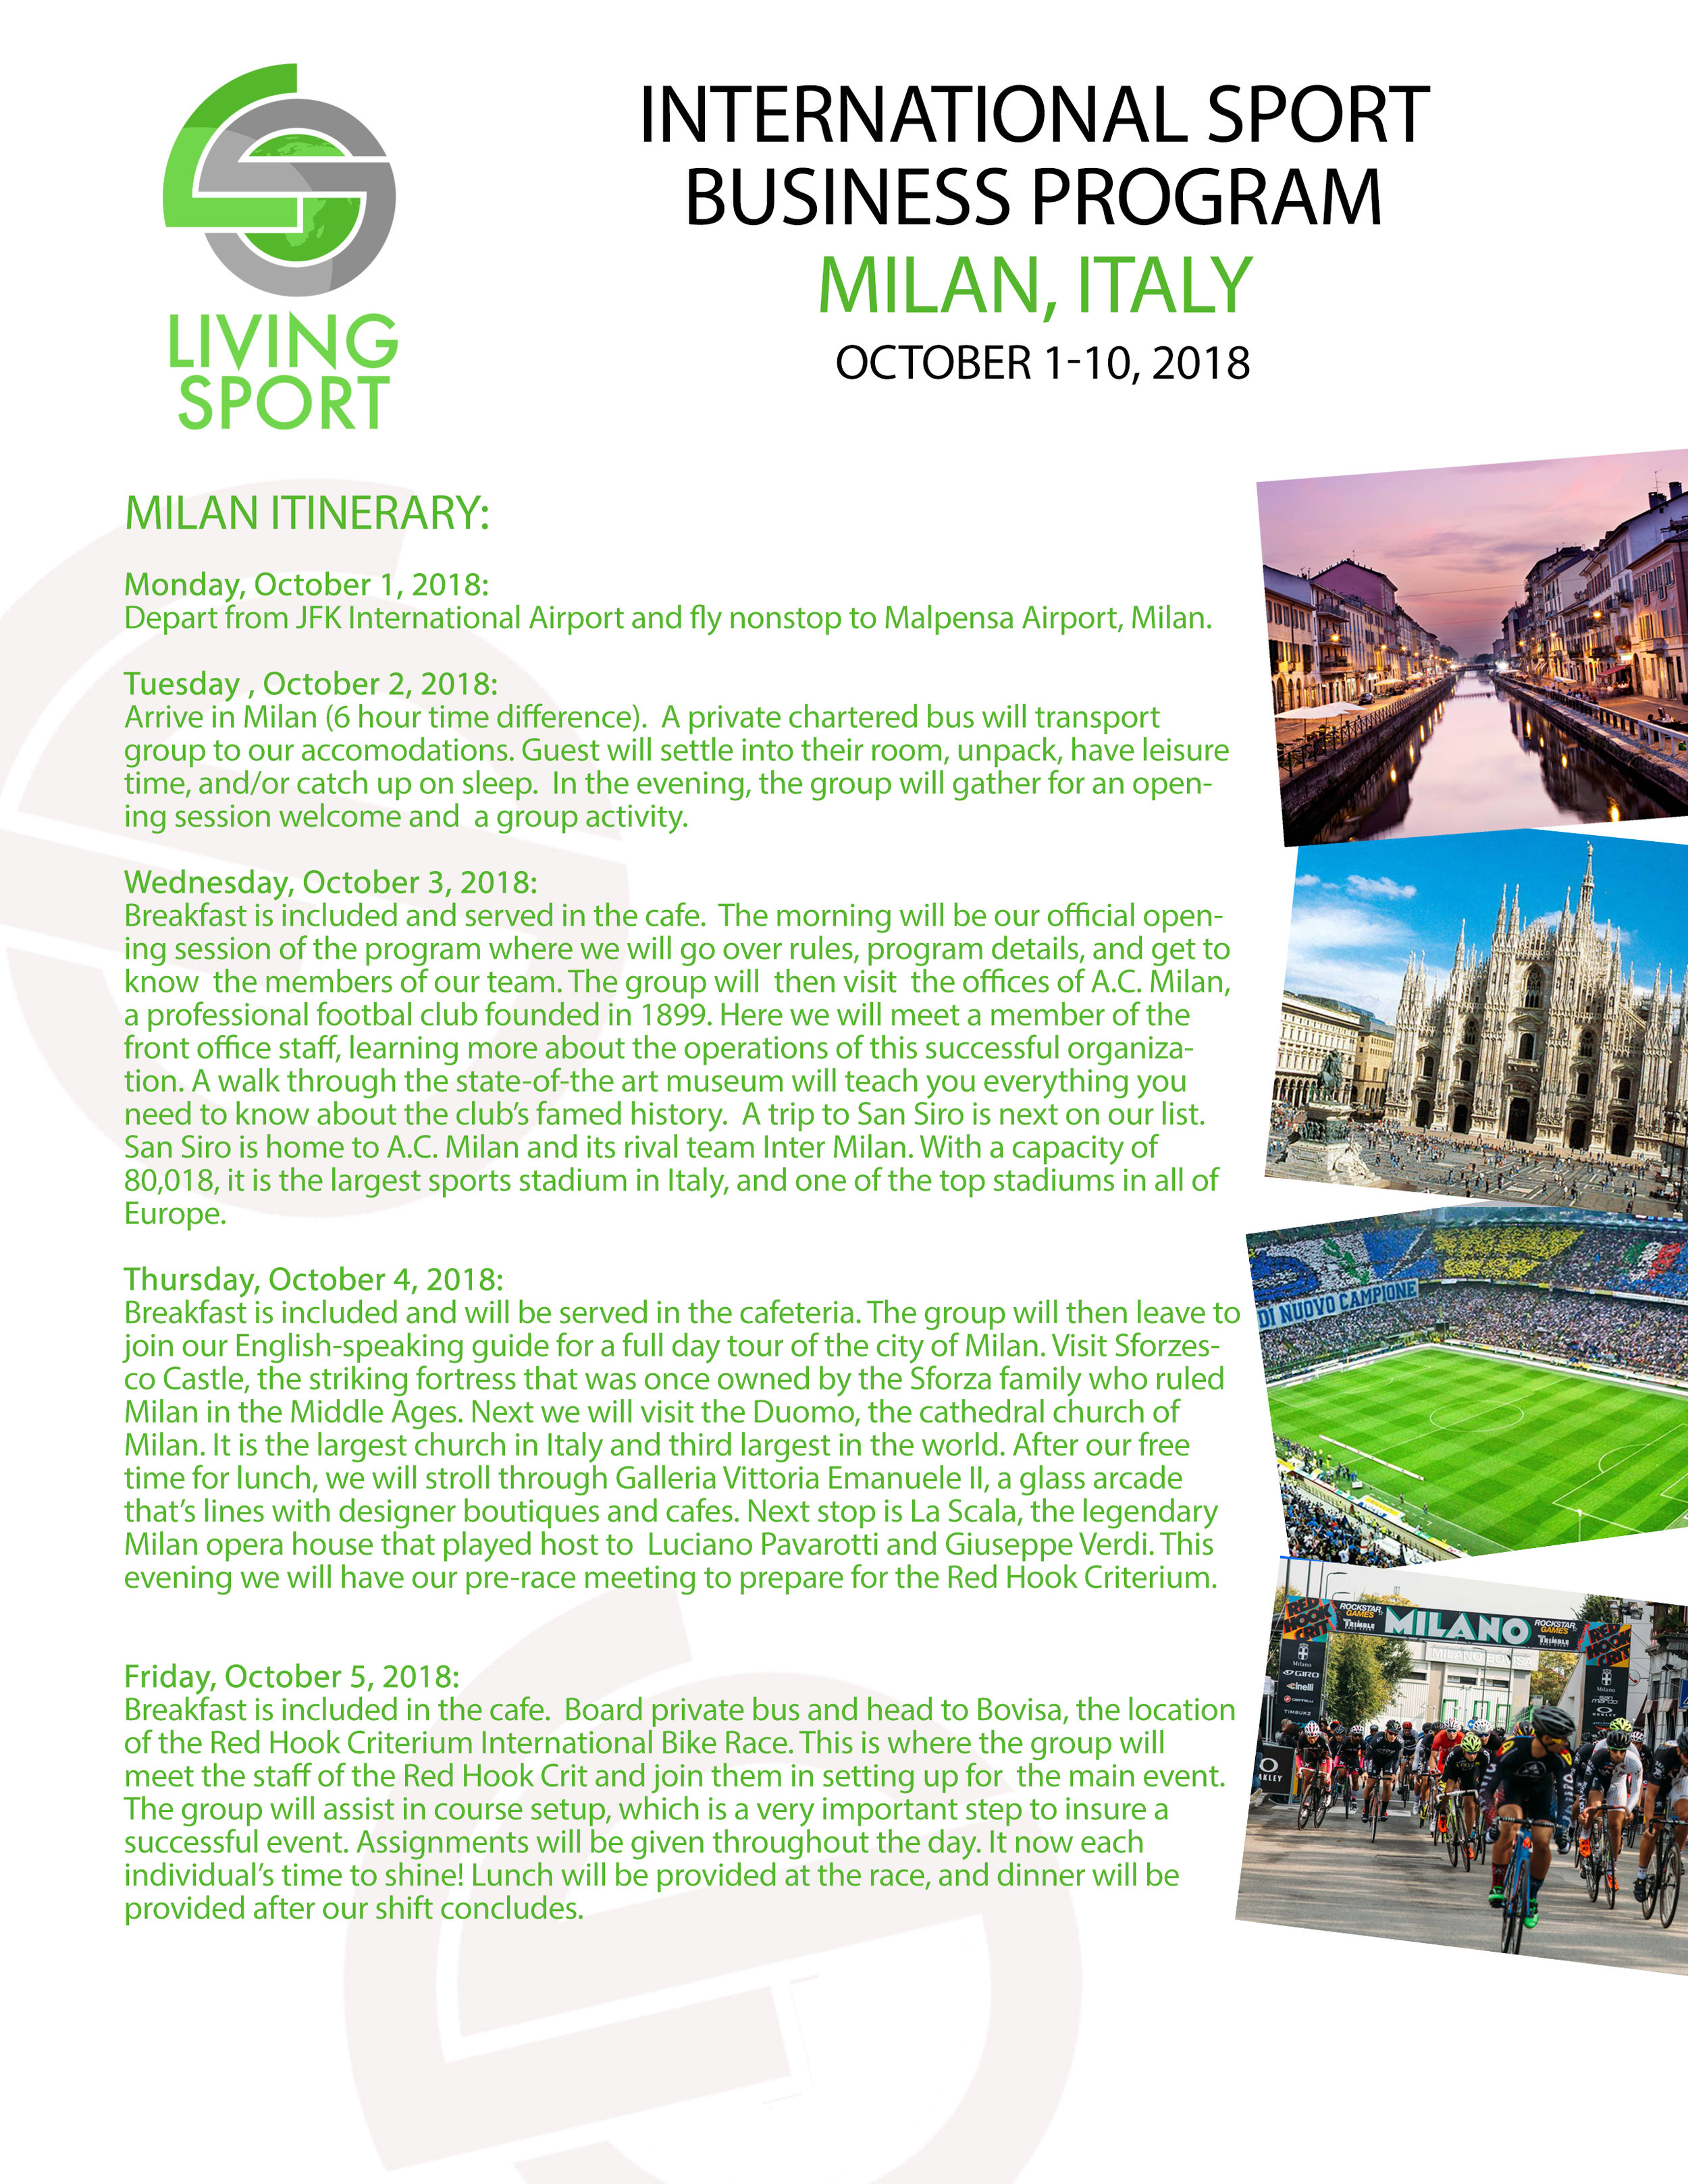 Living Sport- Milan Itinerary 2018.jpg